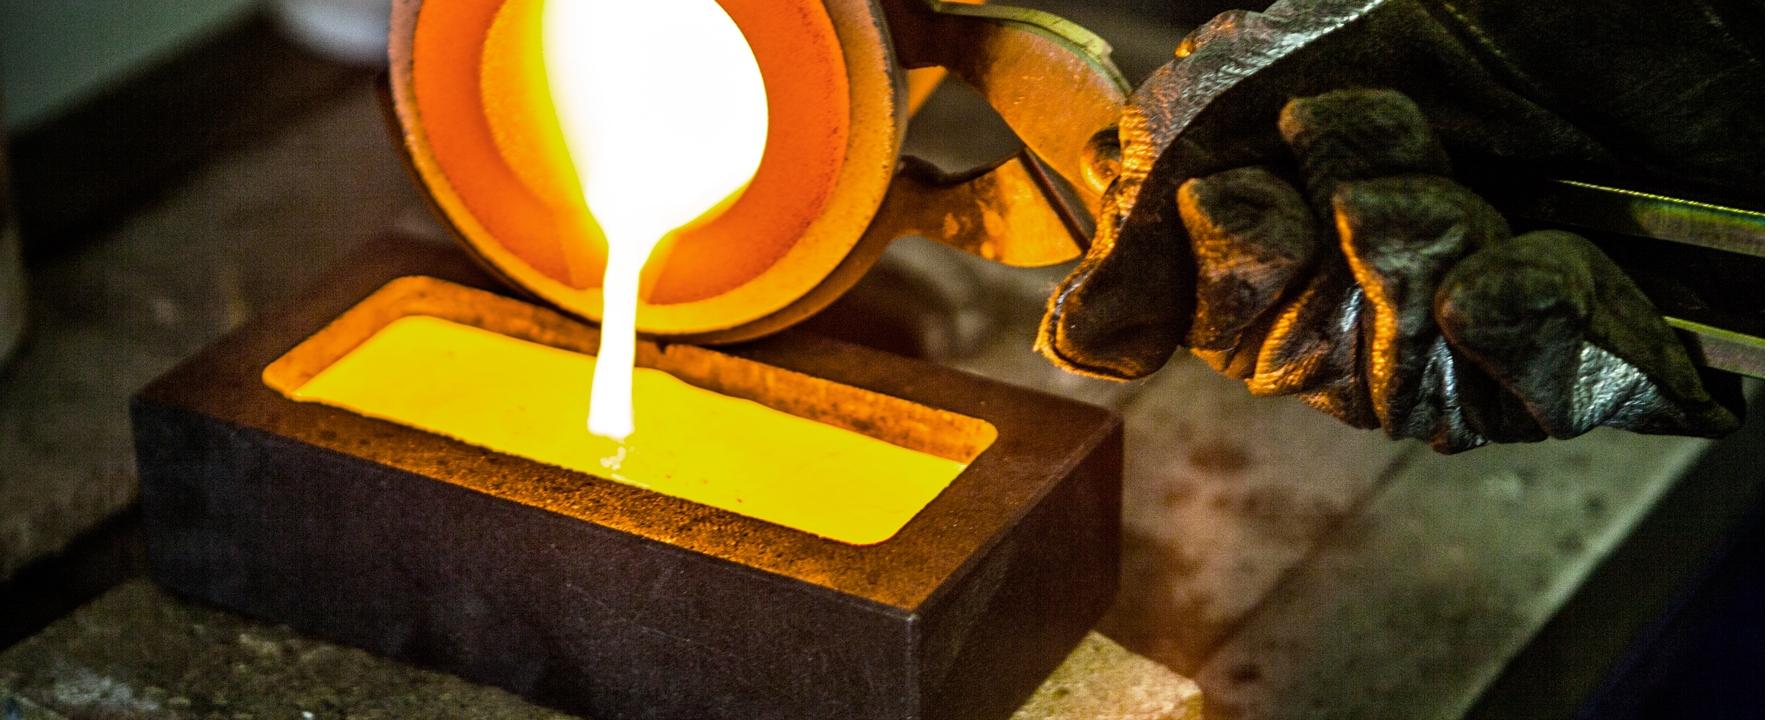 Metal Casting Supplies | PMCSupplies com | PMC Supplies